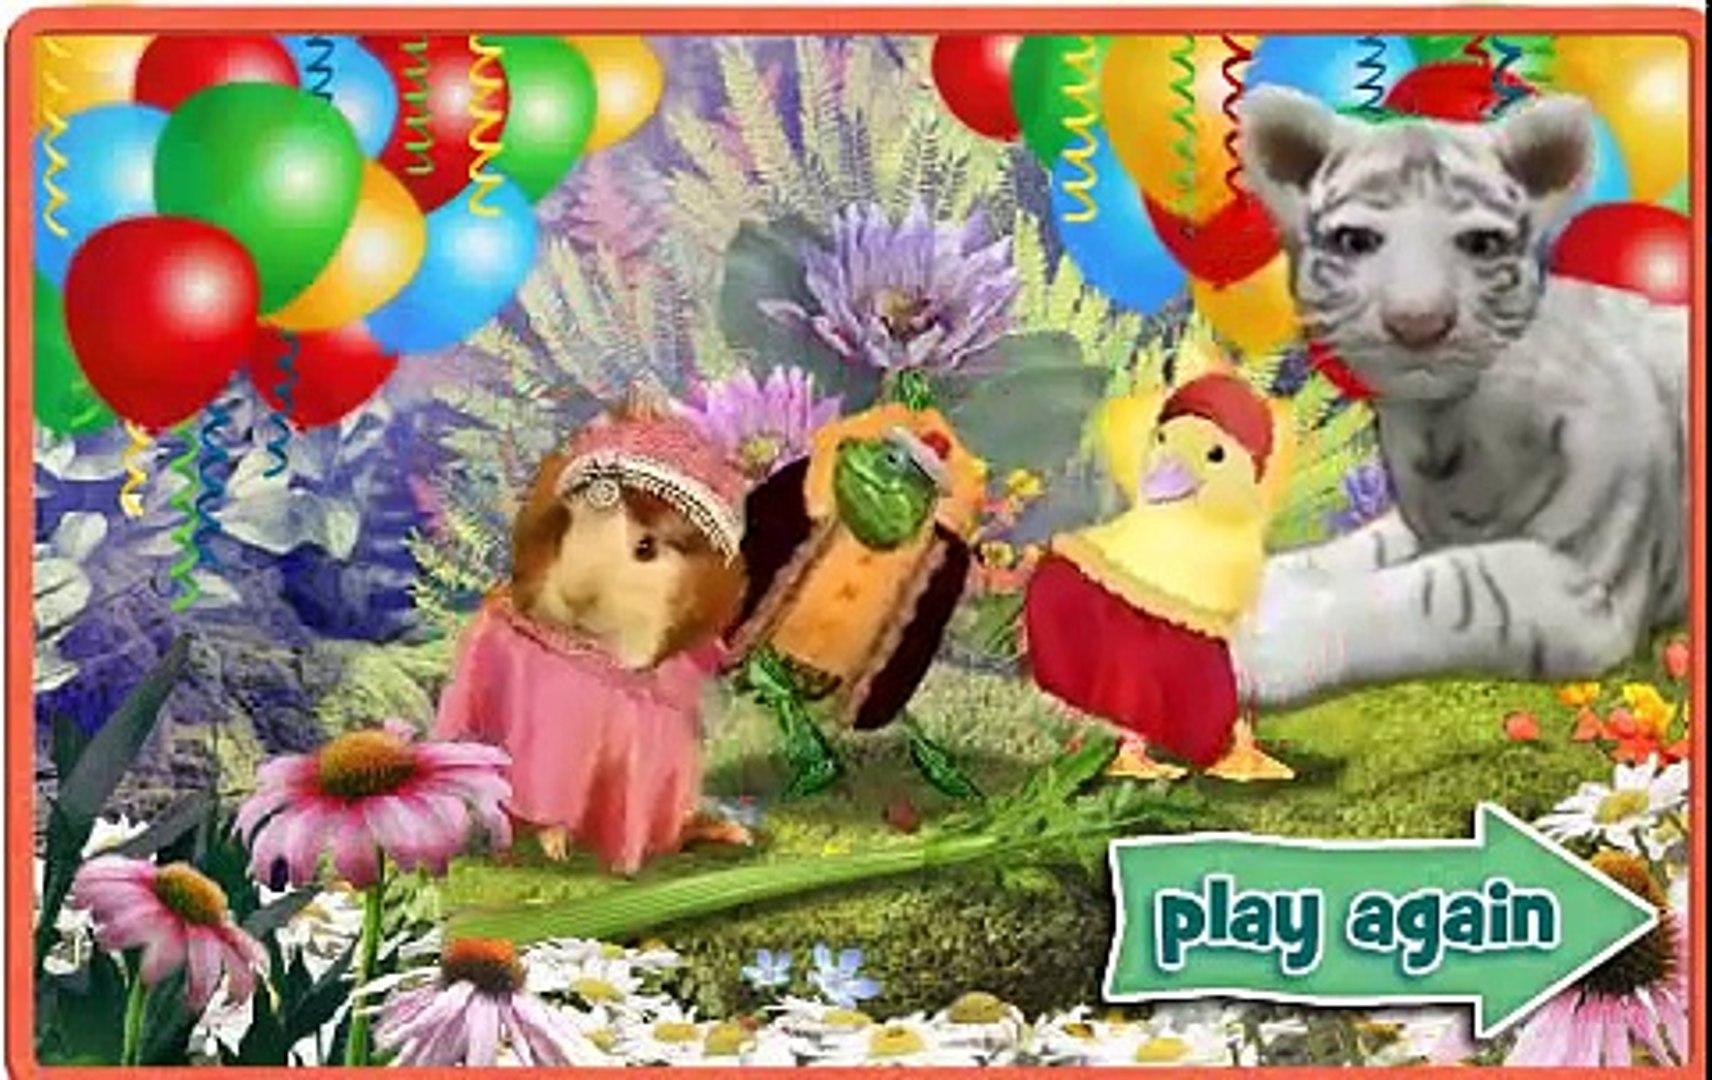 The Wonder Pets Full Episodes - The Wonder Pets Save the Mouse - Wonder Pets Full Episodes